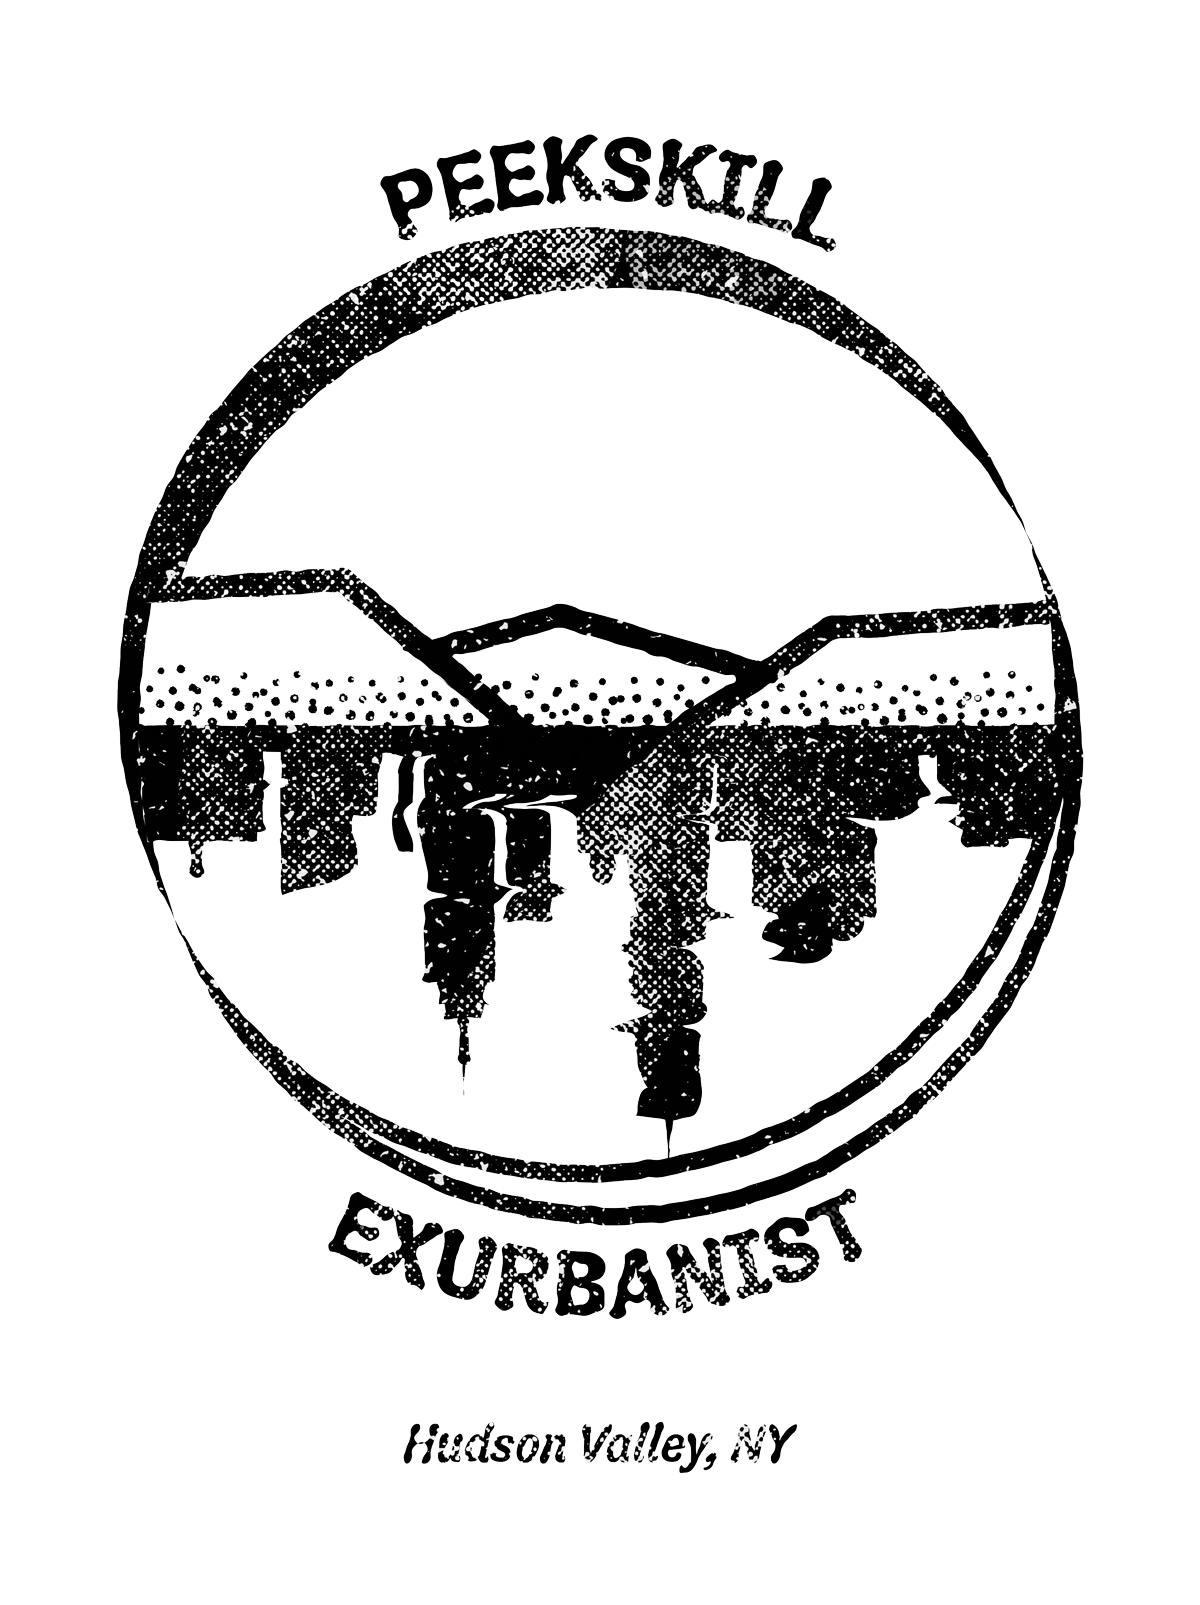 exurbanist new logo